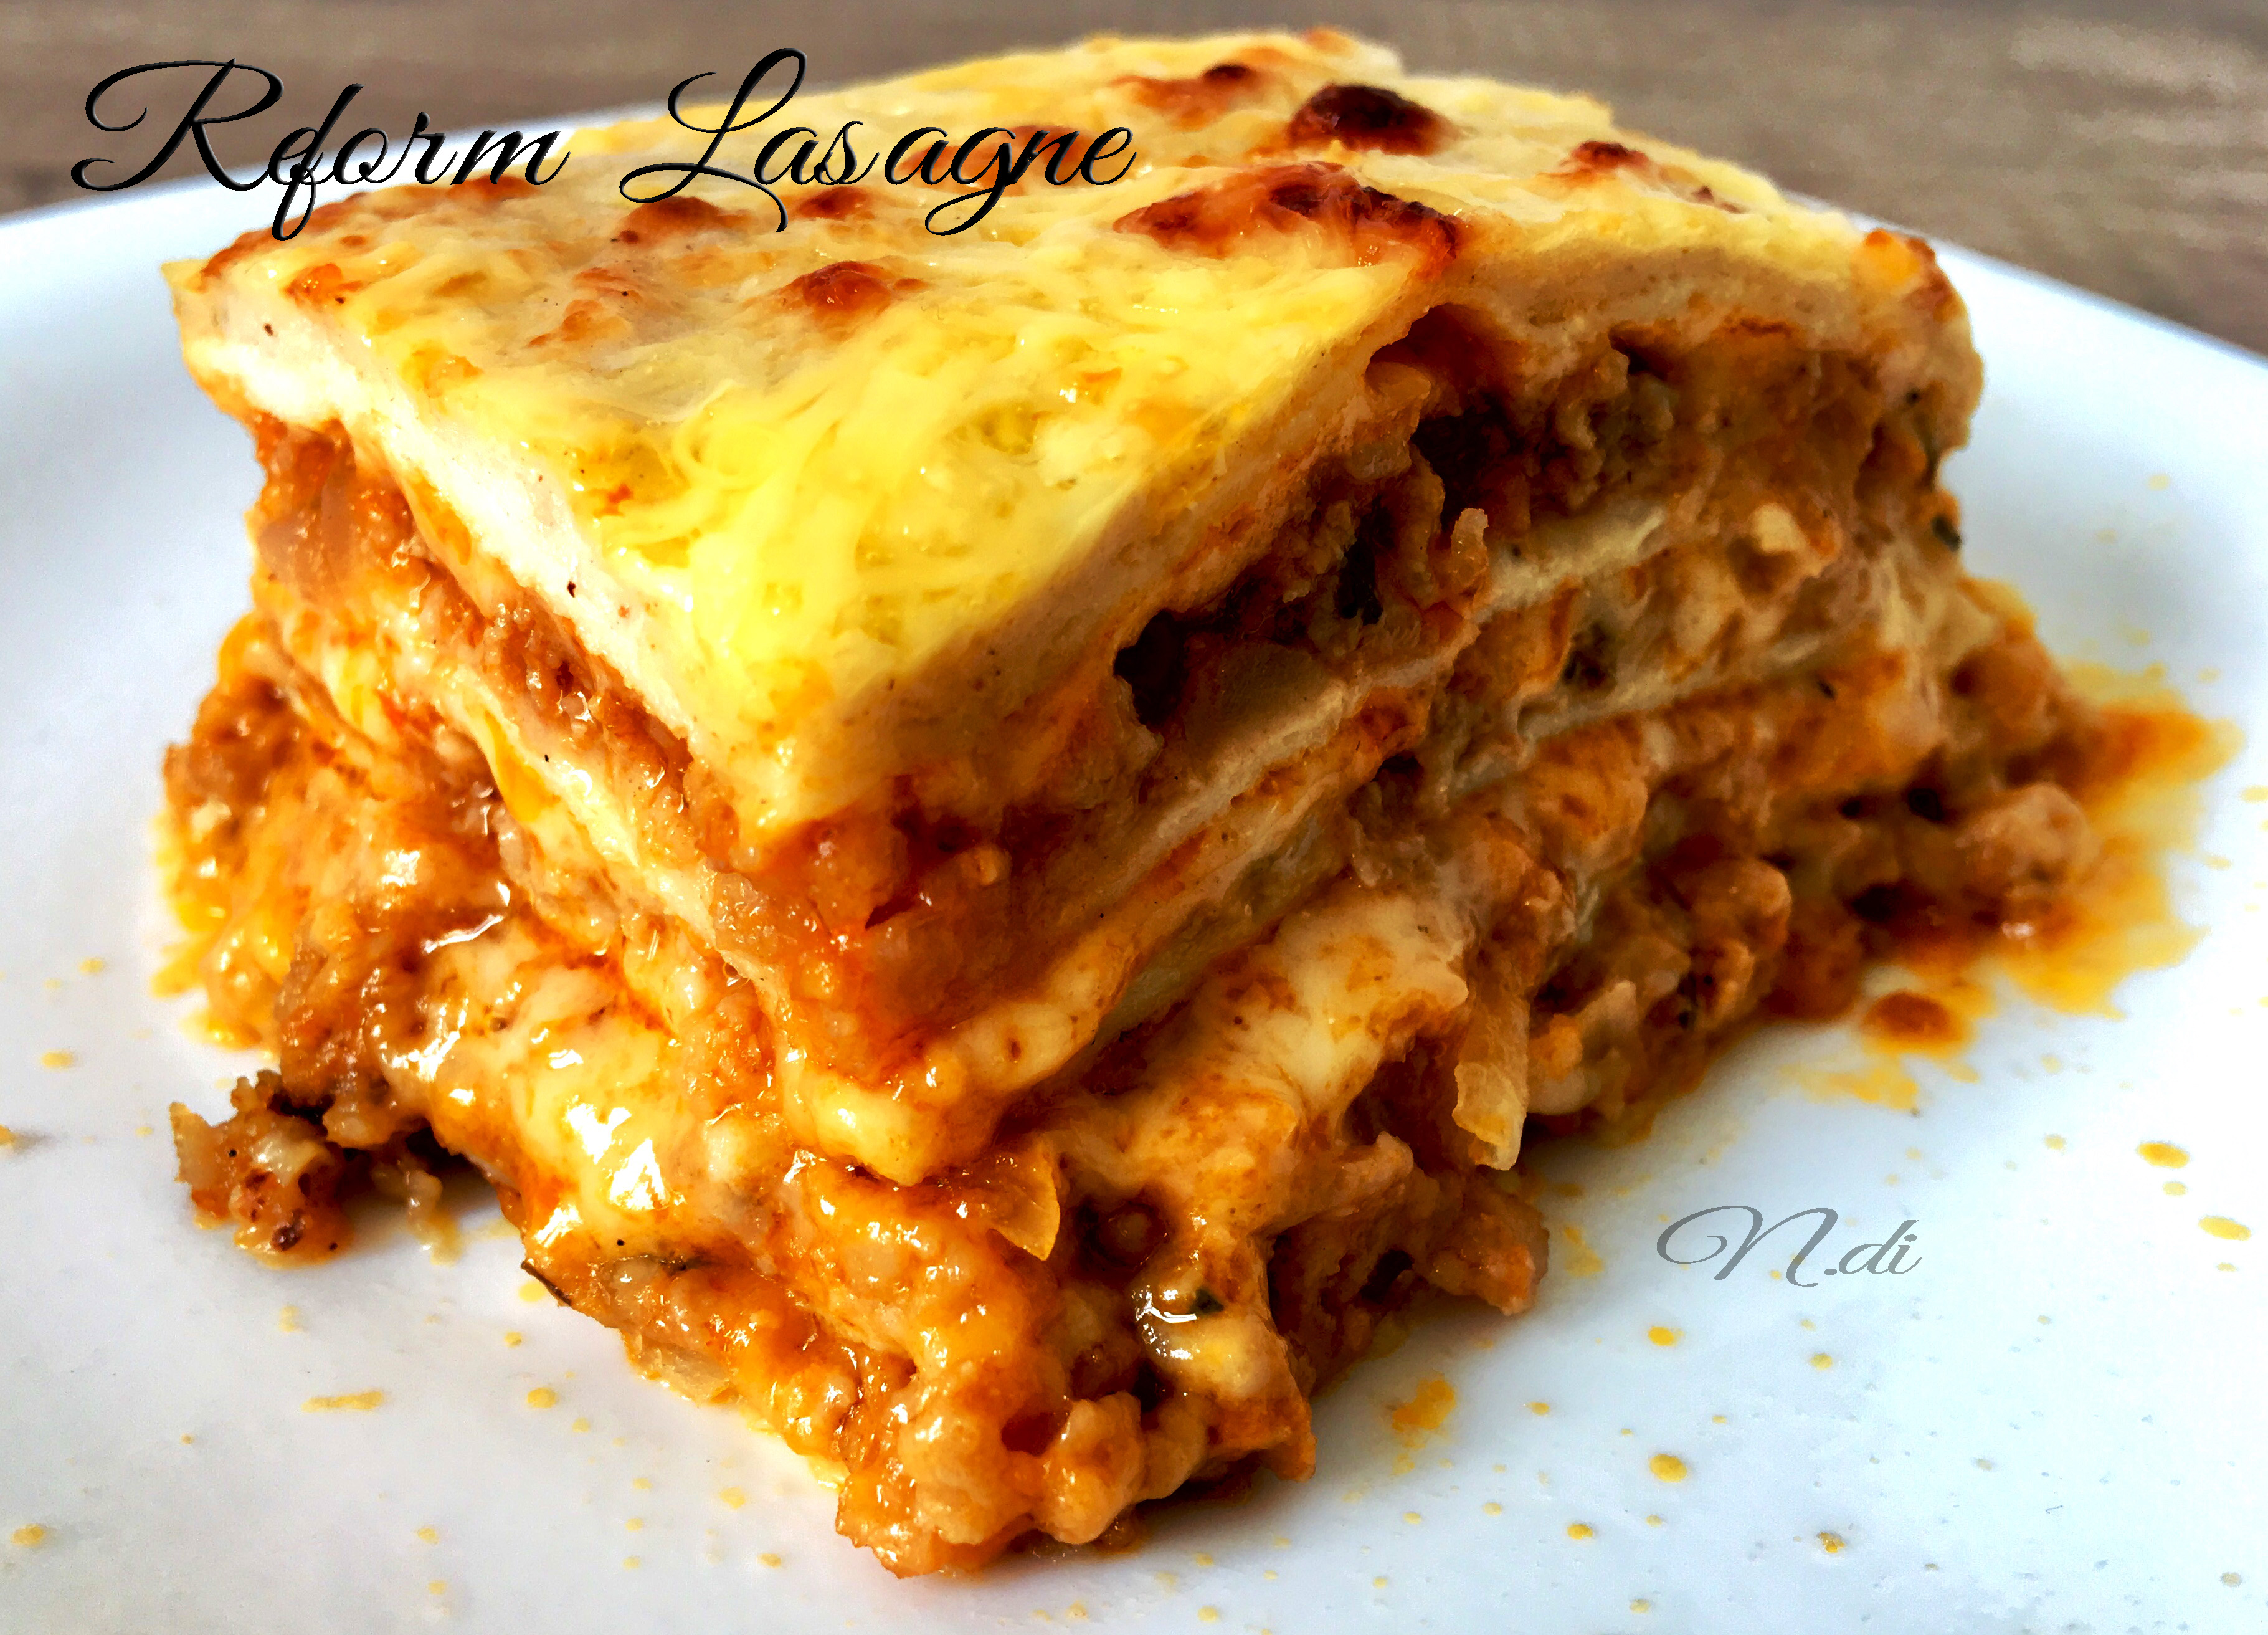 Reform Lasagne